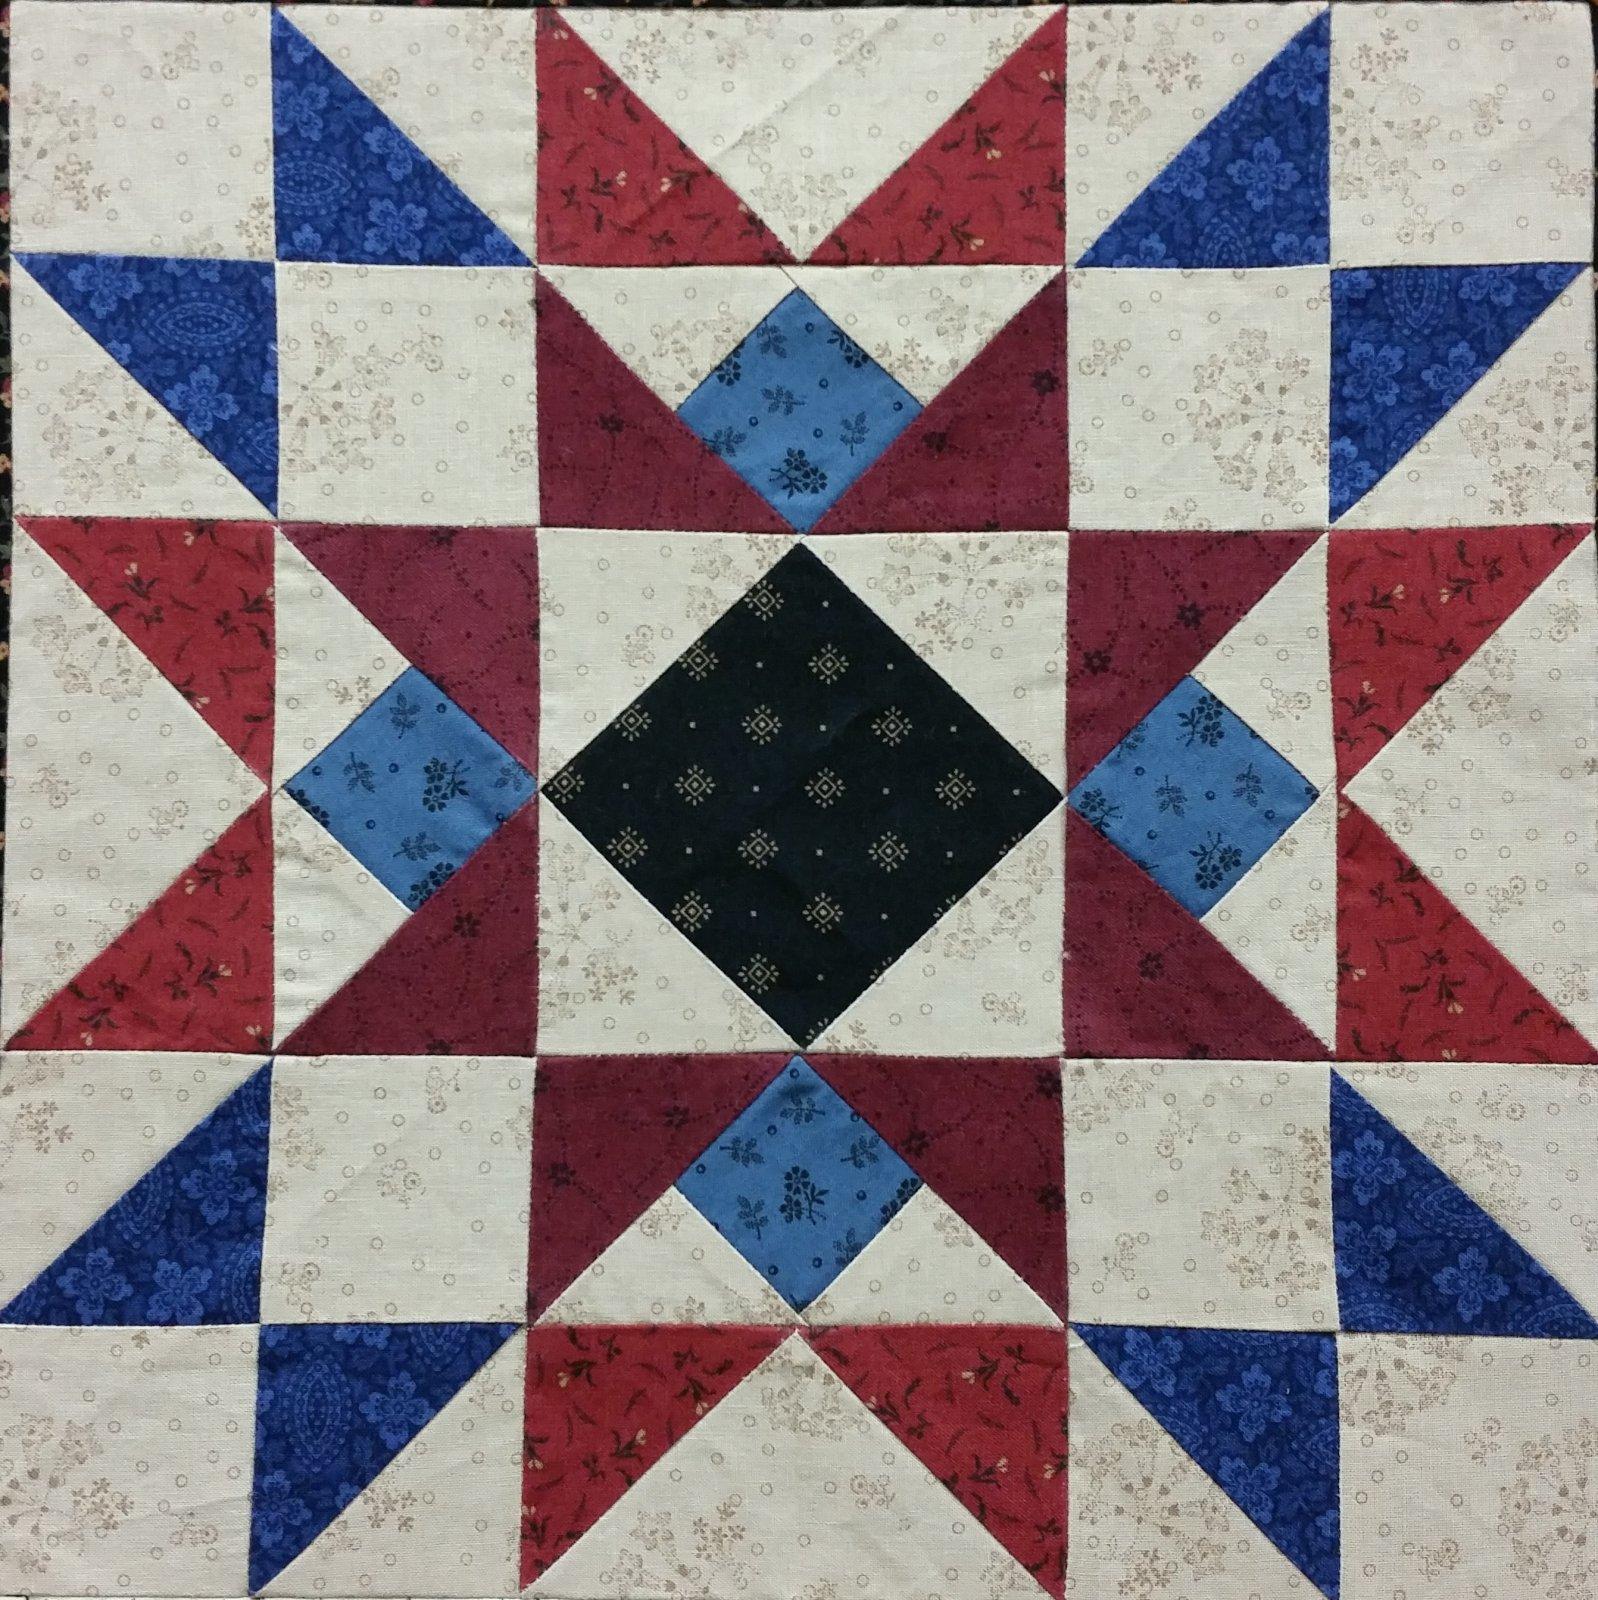 Chesapeake Wishing Star Repro Fabric Version 2018 Quilts Around the Bay Block Kit